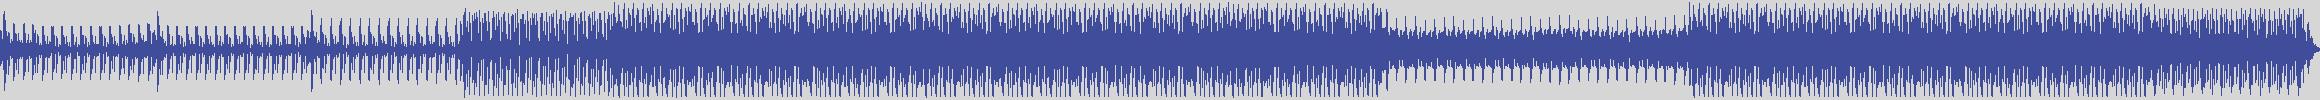 workin [WRK008] Victor Sandeman - Voice or Not [Night Beatz Mix] audio wave form